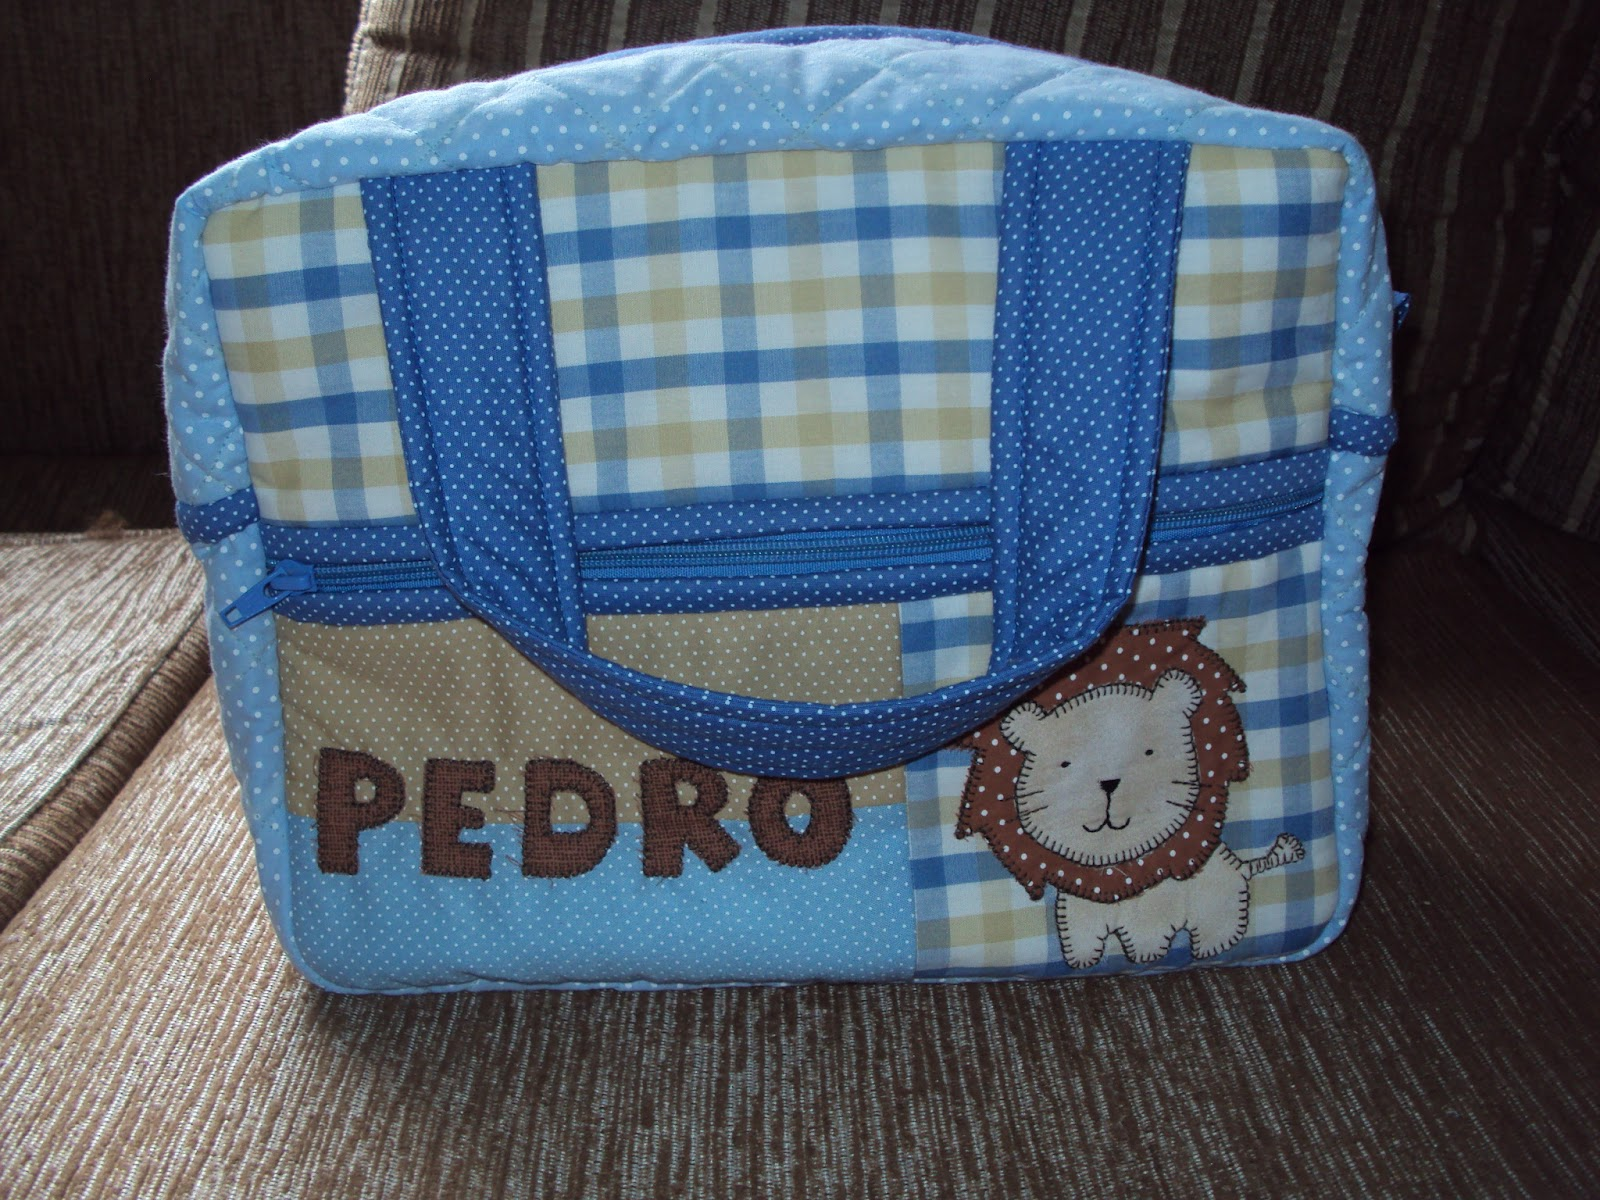 Bolsa Del Embrion Pequeña : Maria patchwork e cia bolsa beb? pequena menino